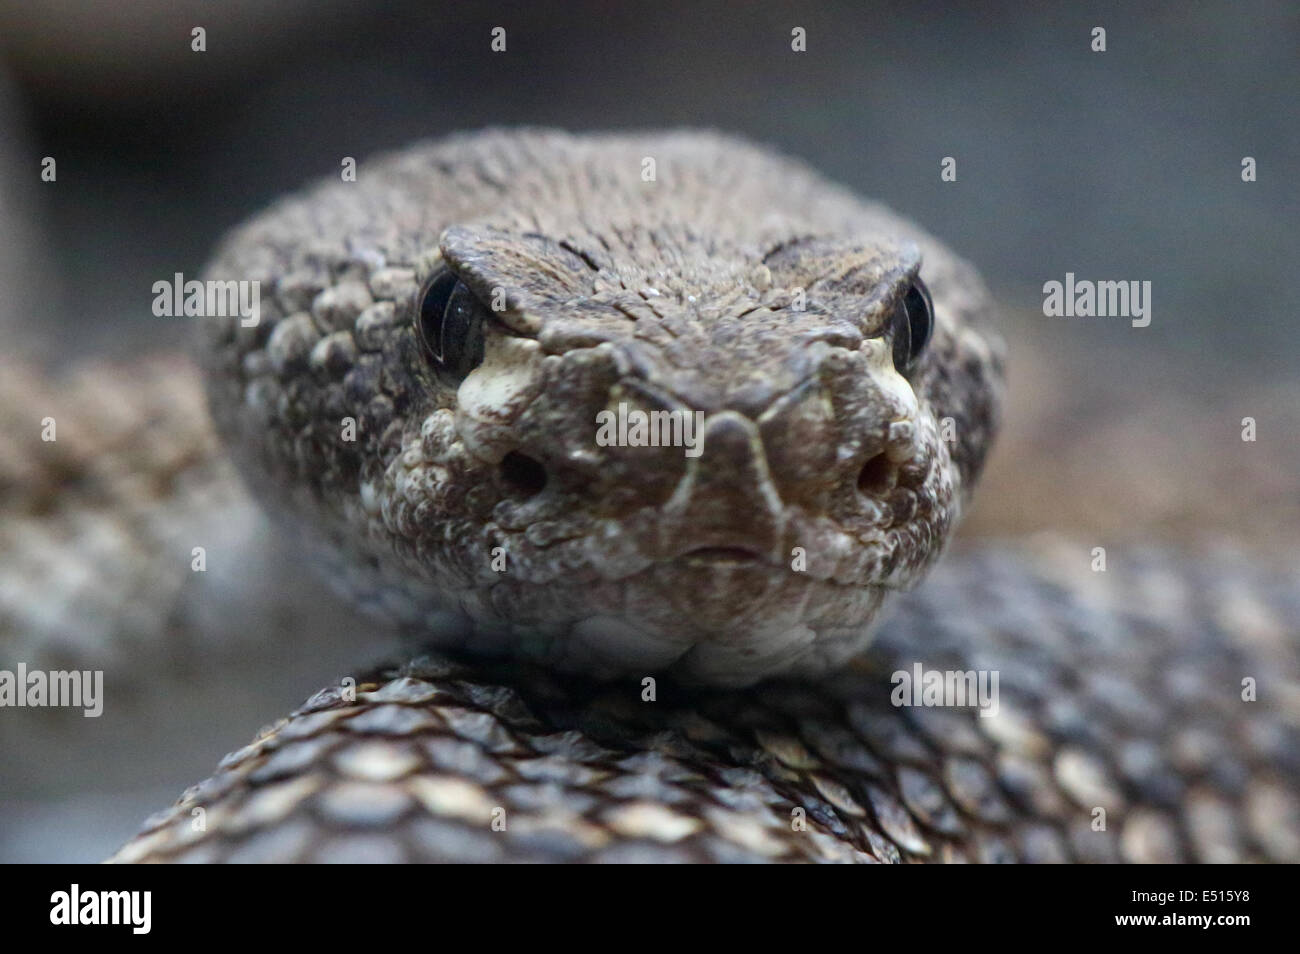 Frontside Stockfotos & Frontside Bilder - Alamy